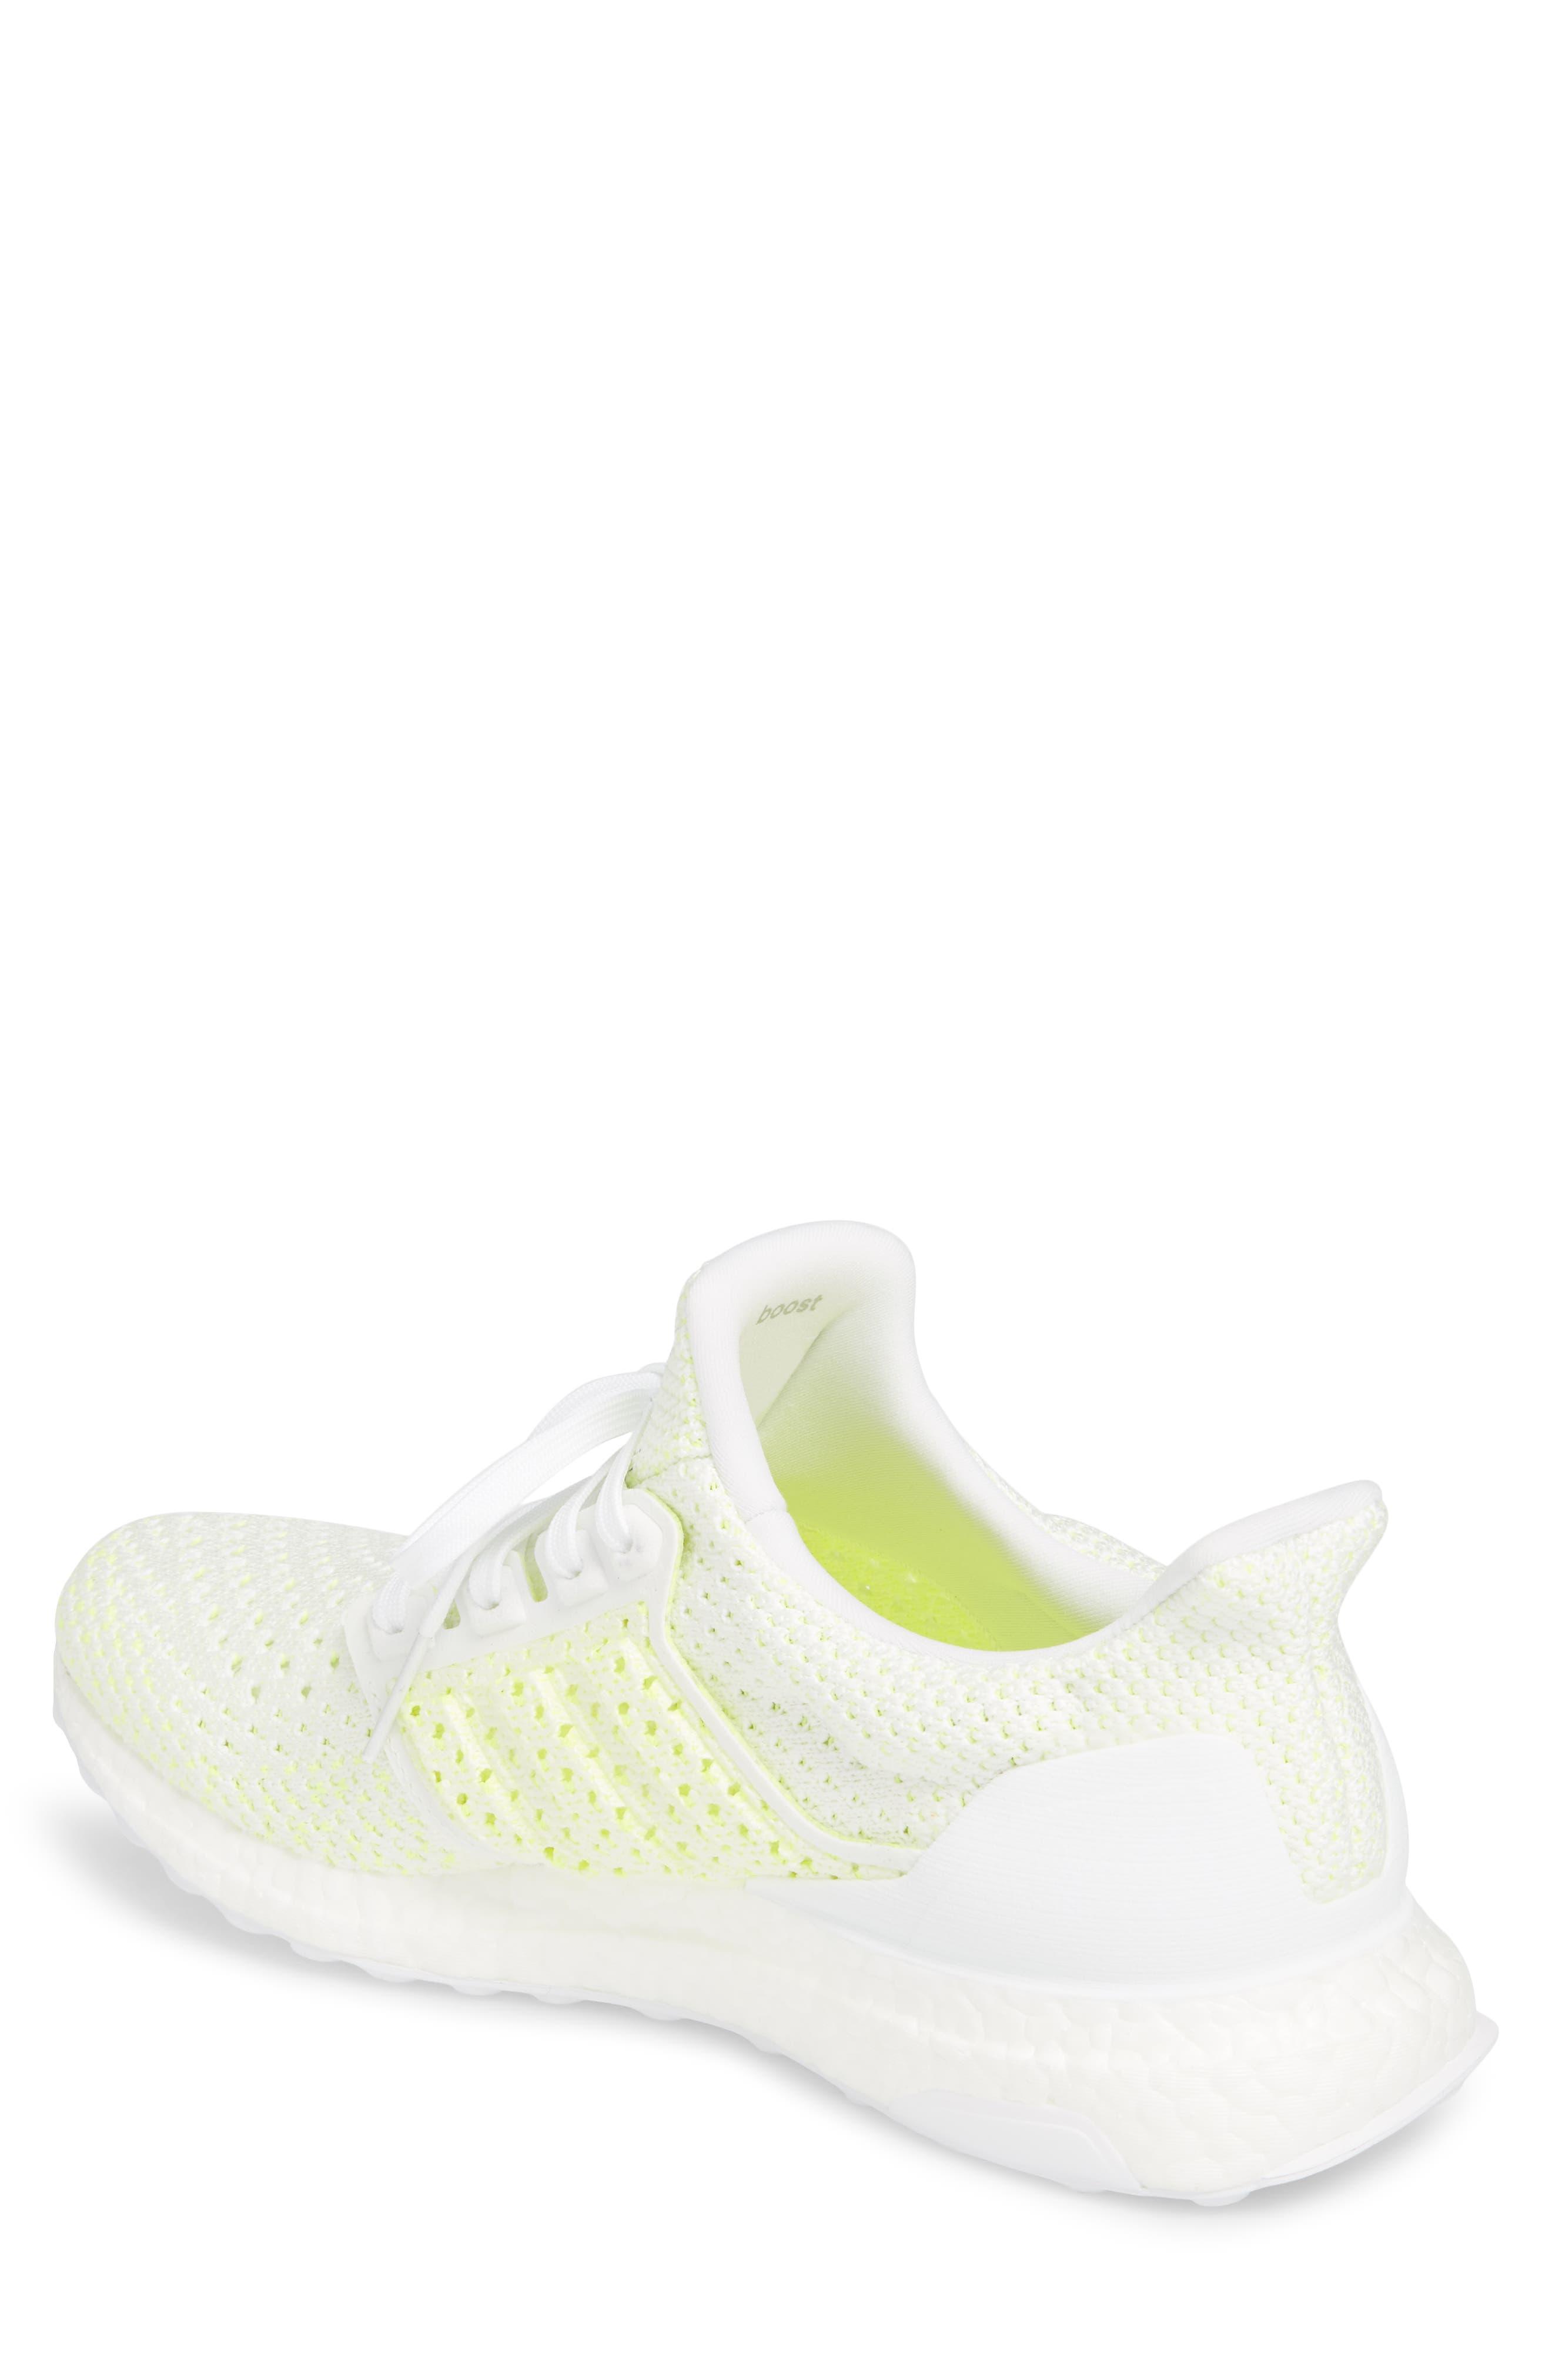 Ultraboost x Clima Running Shoe,                             Alternate thumbnail 2, color,                             WHITE/ WHITE/ SOLAR RED